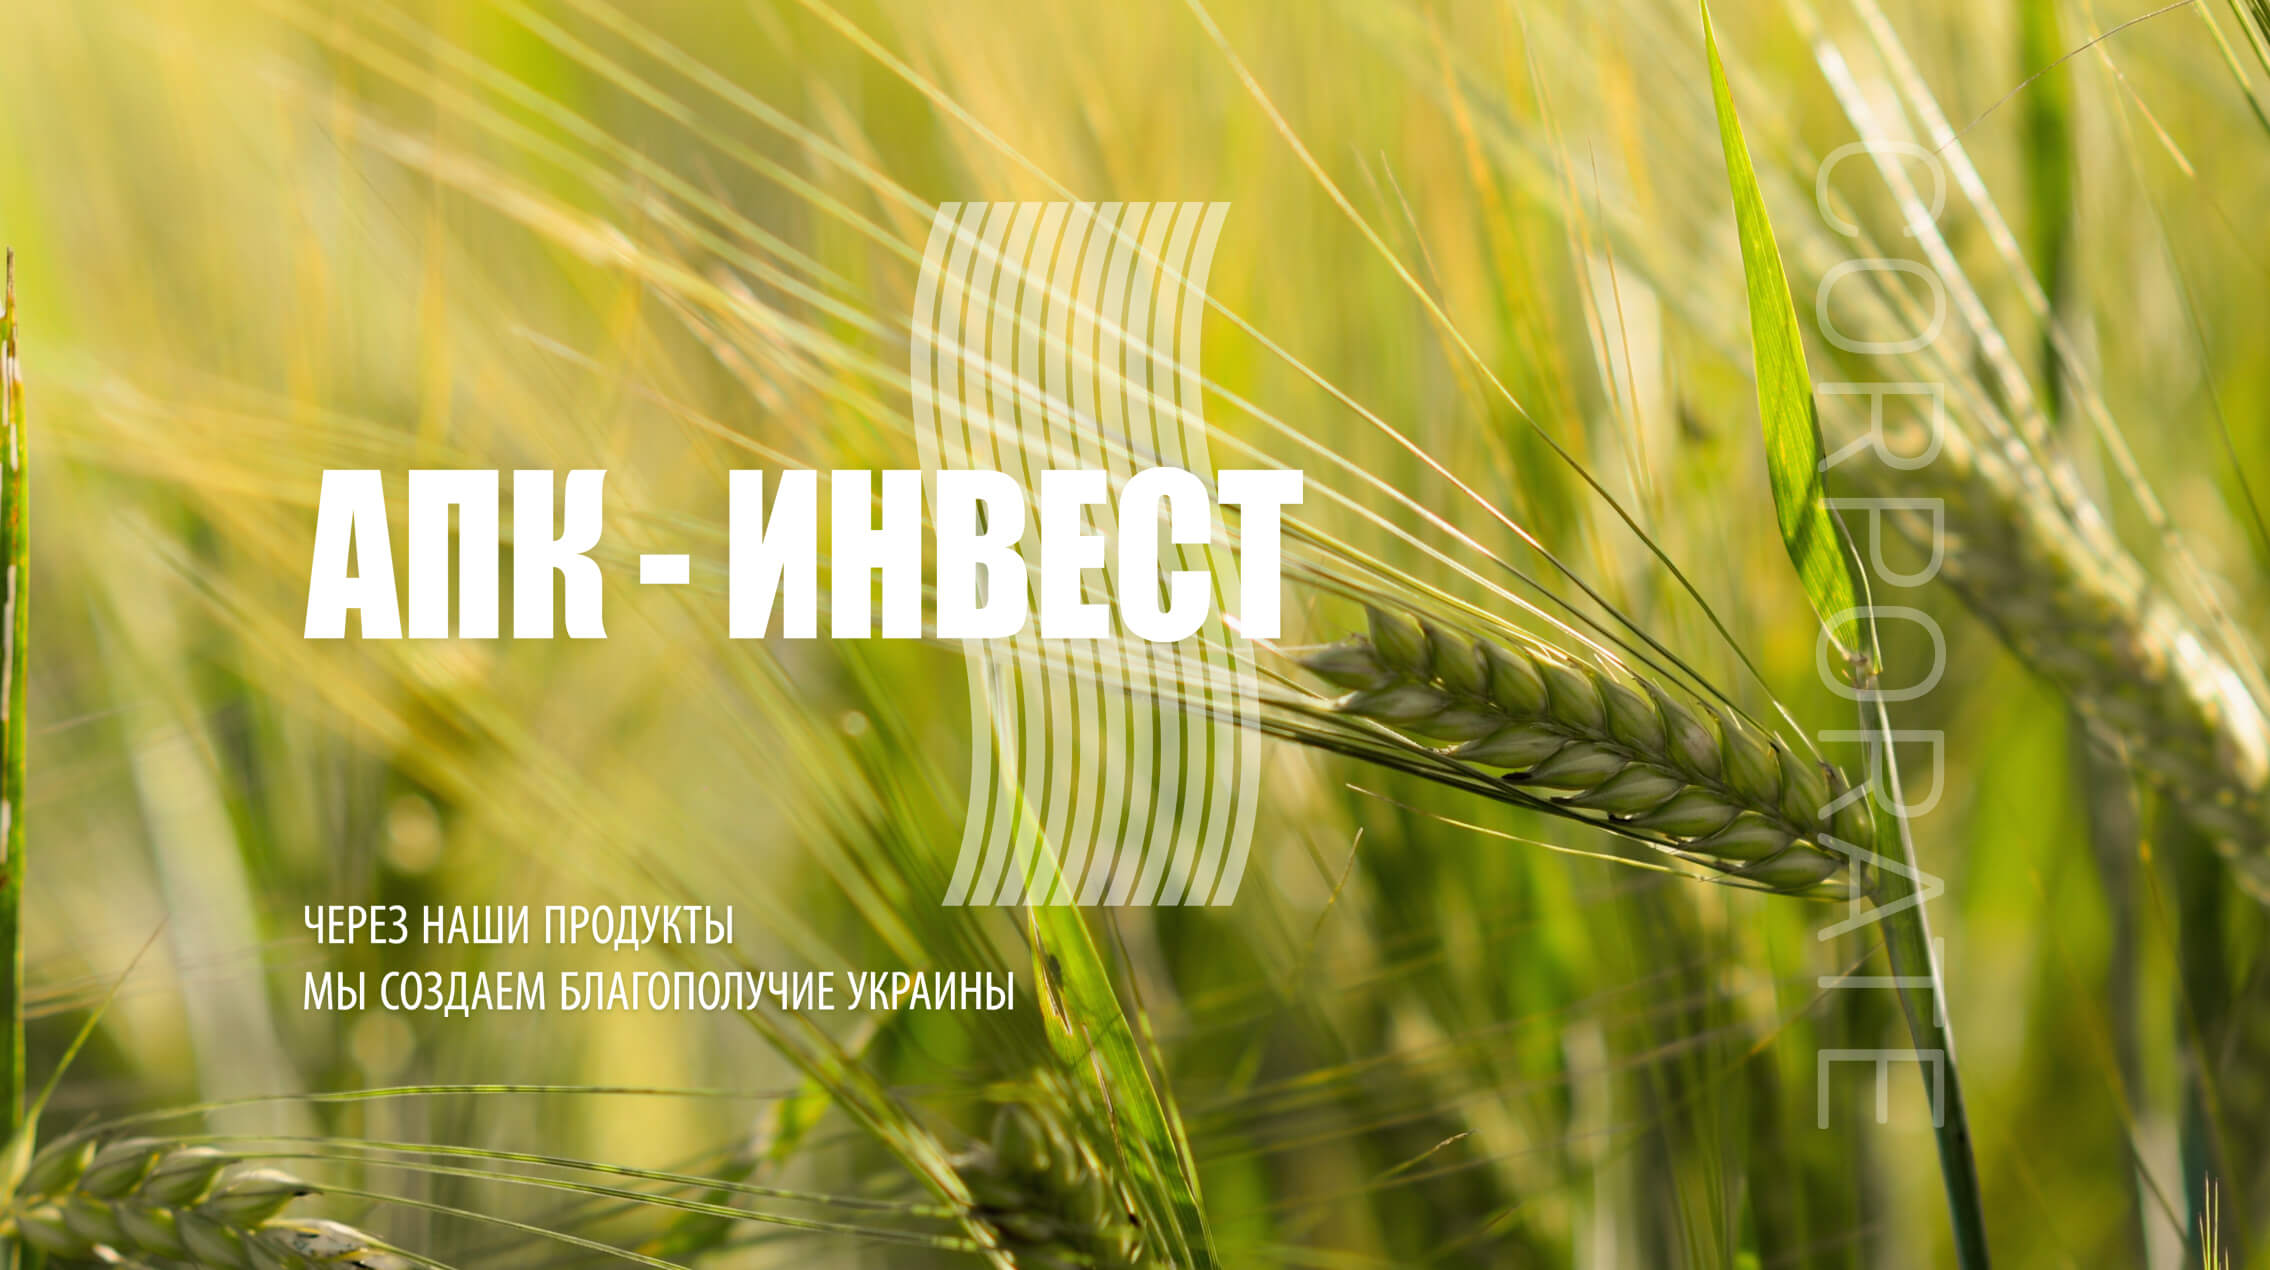 Корпоративный сайт для компании АПК-ИНВЕСТ